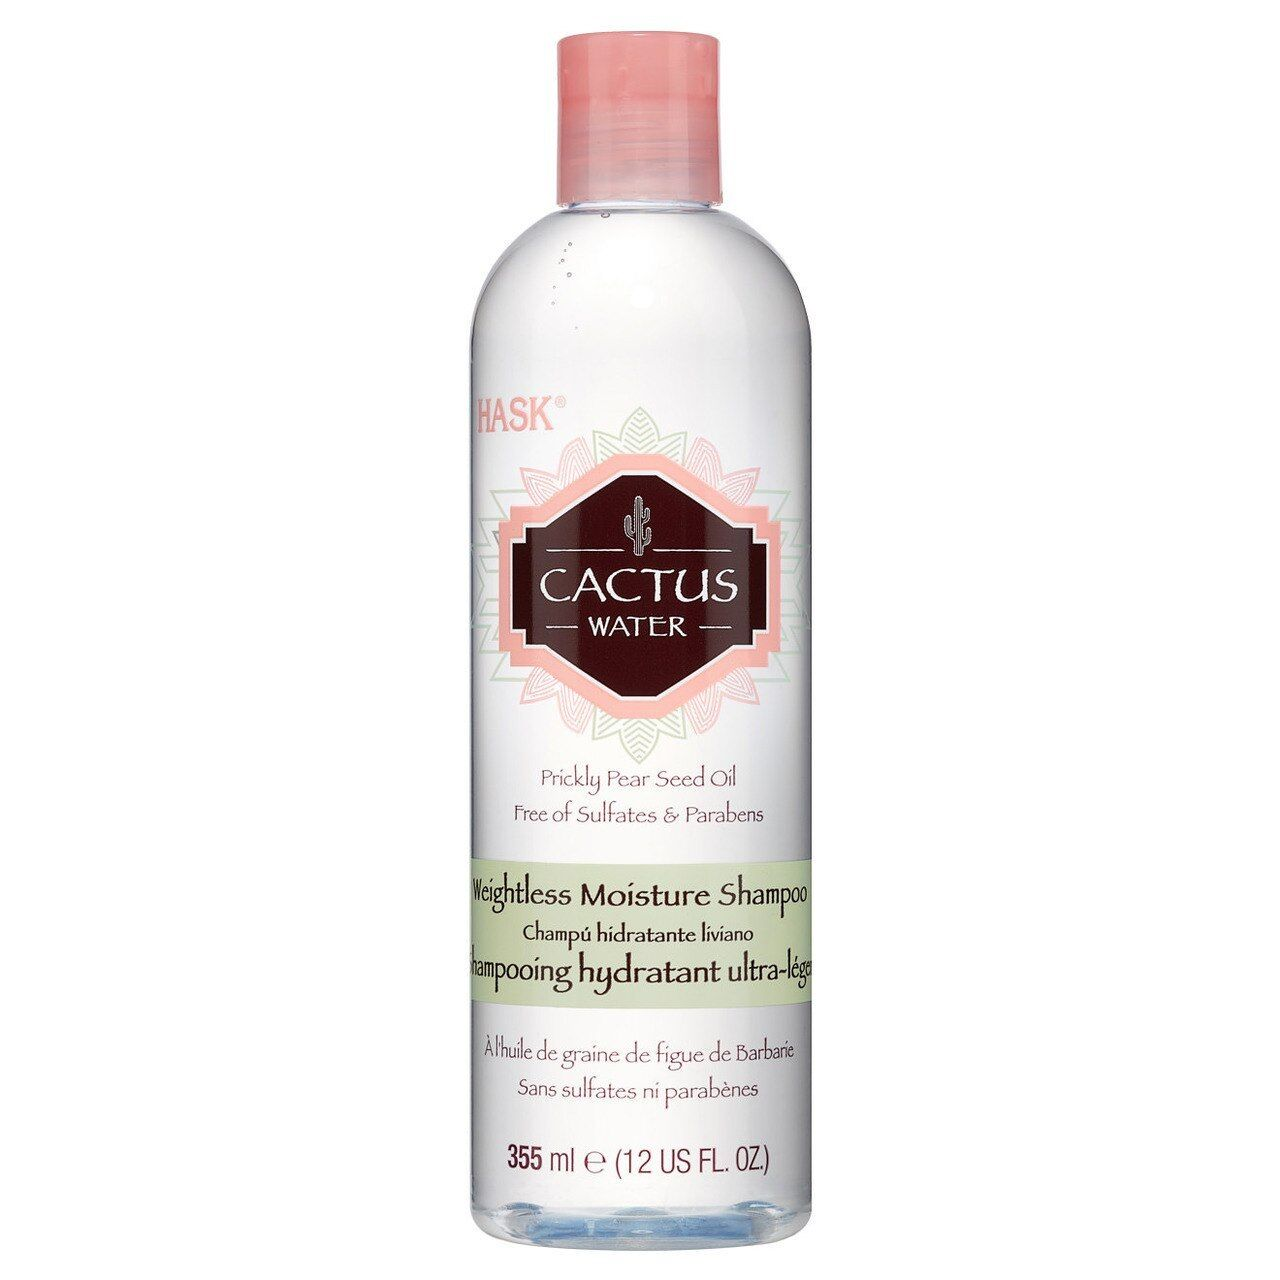 Hask Cactus Water Weightless Moisture Shampoo 12 oz